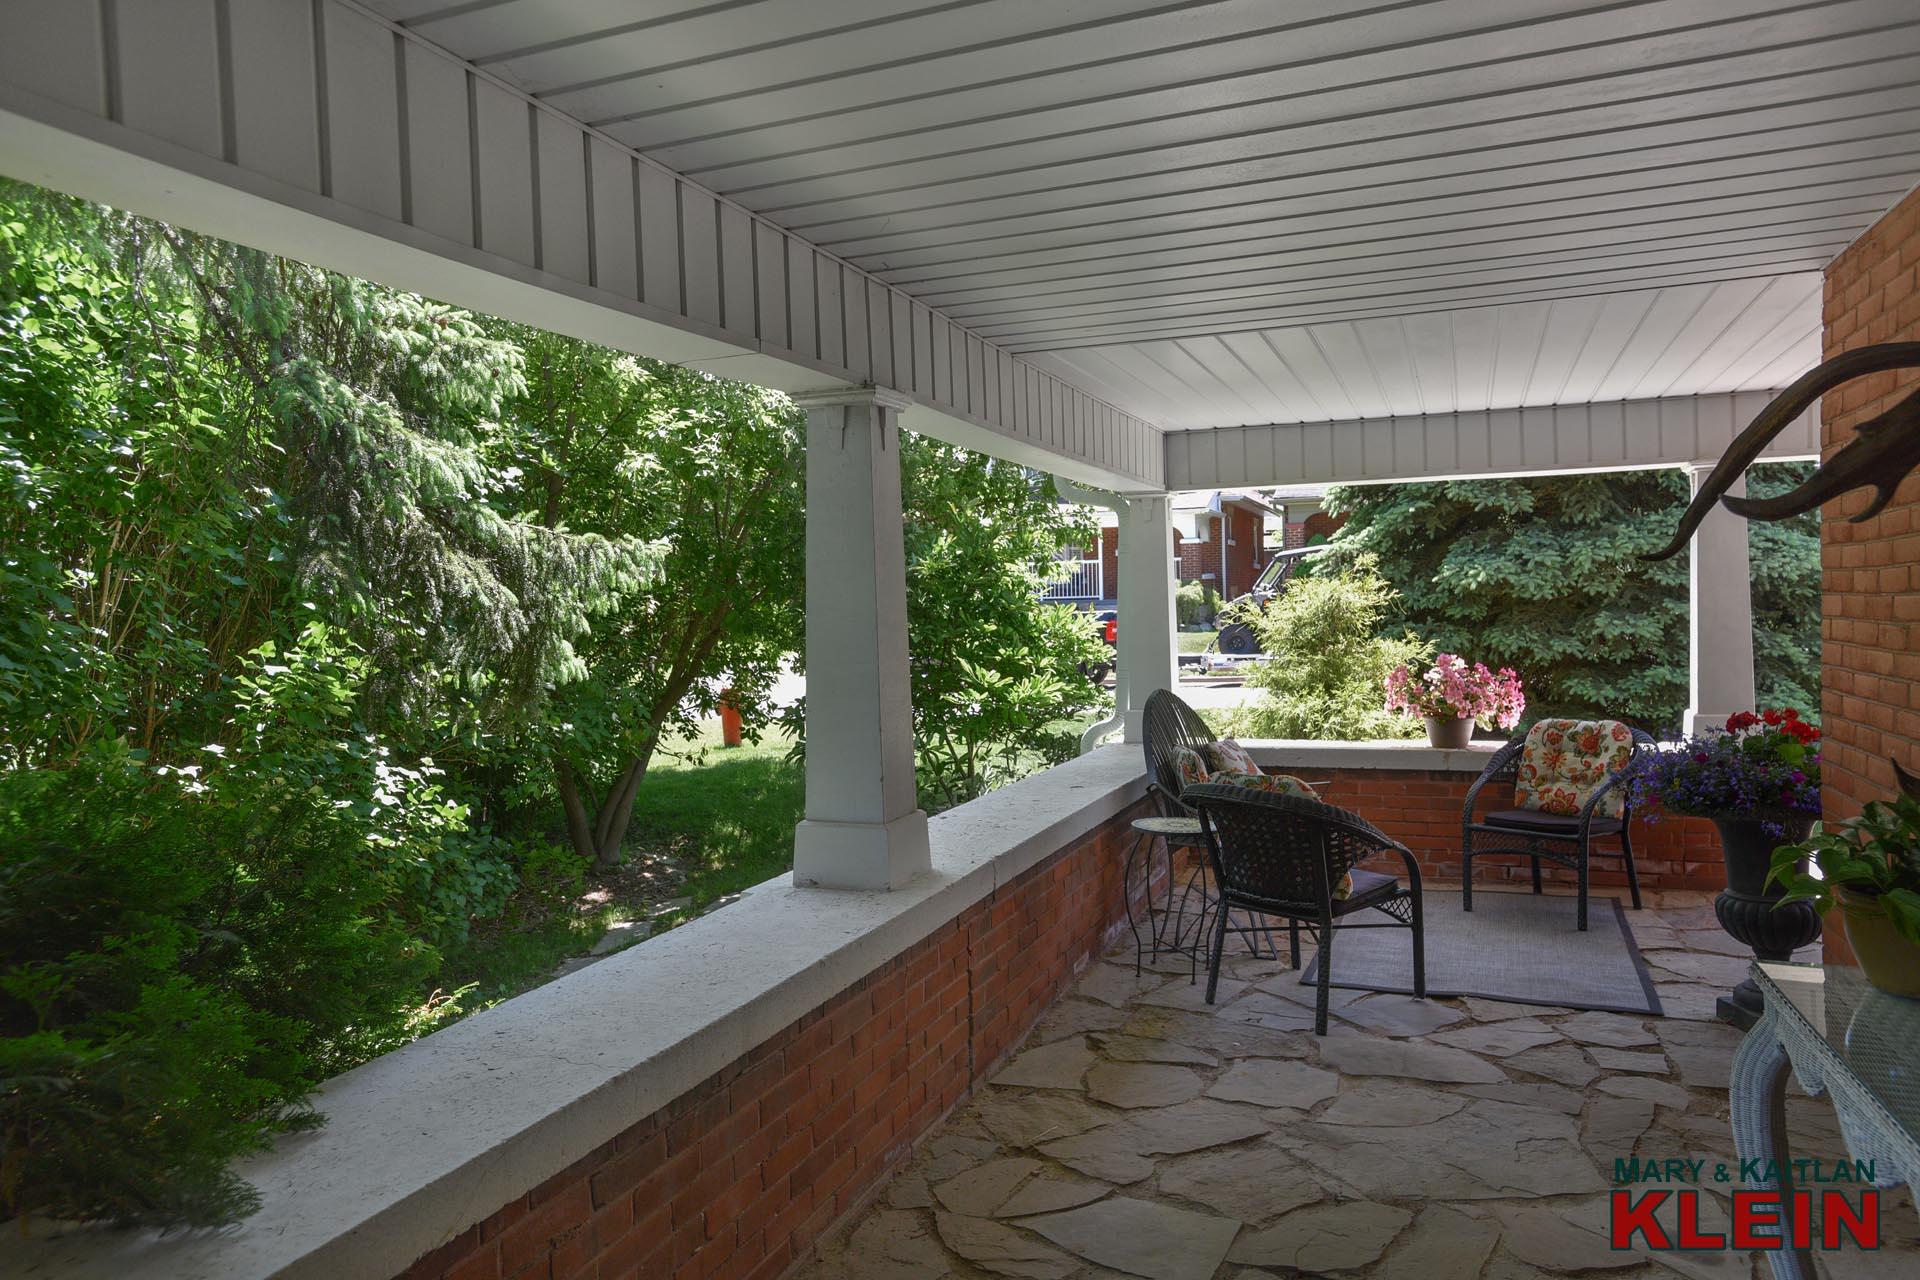 wrap around porch, front verandah